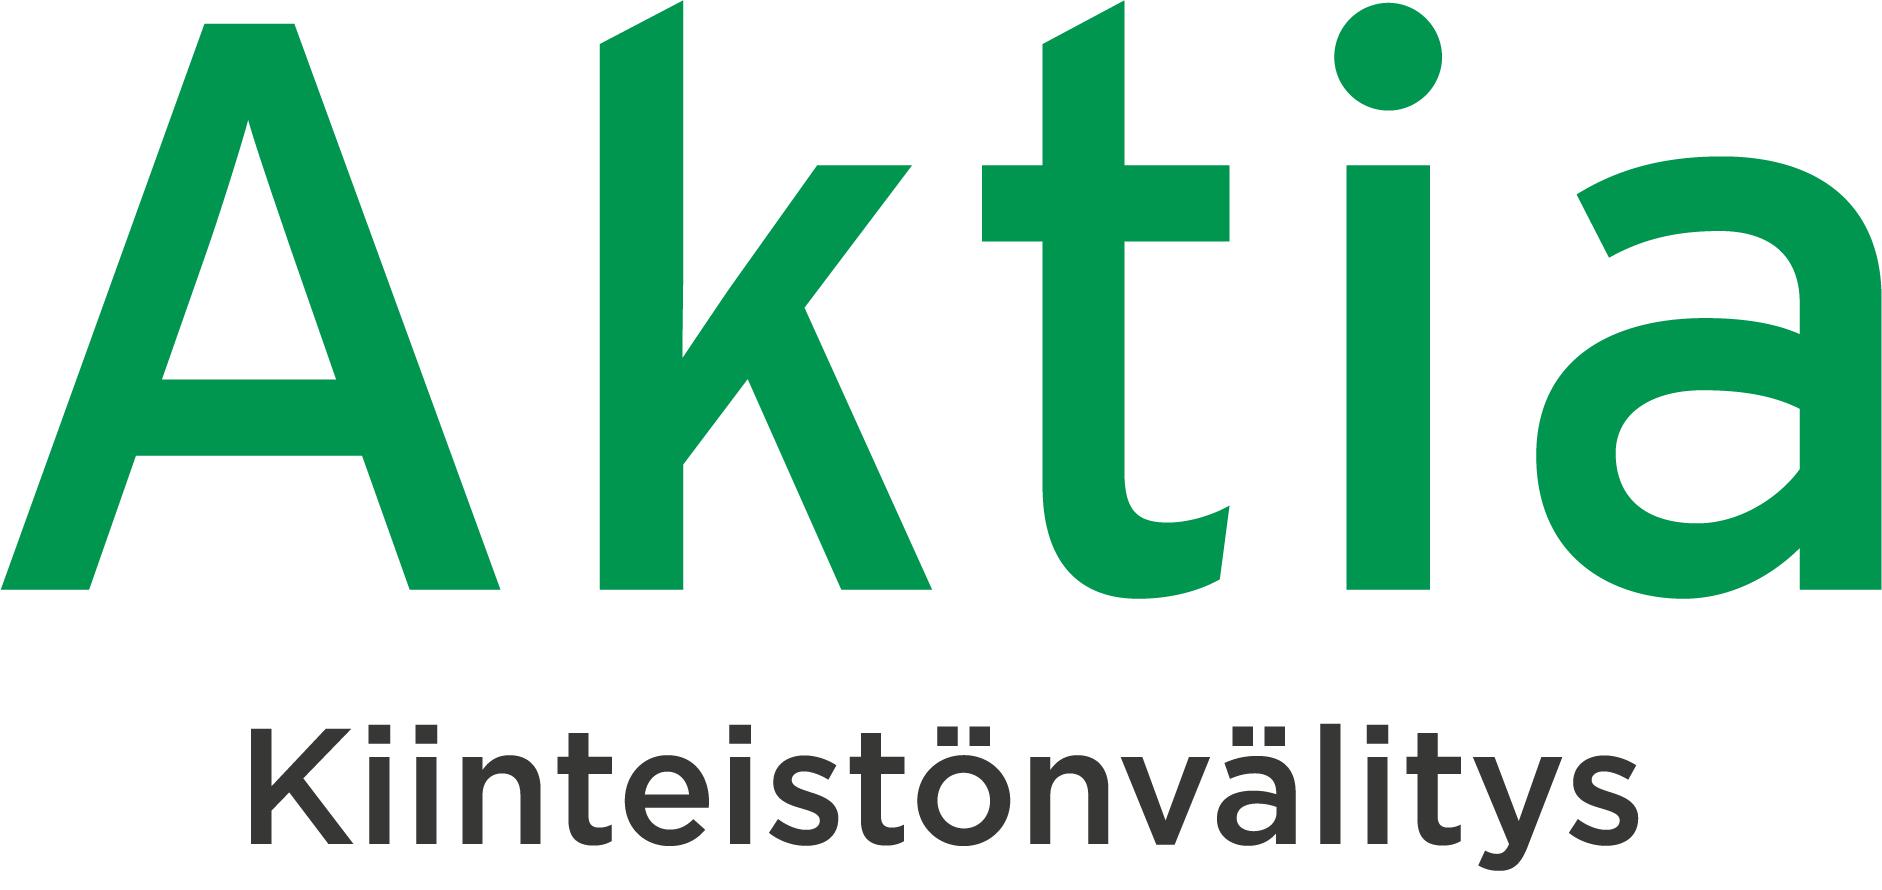 Aktia Kiinteistönvälitys Oy, Inkoo, Aktia Fastighetsförmedli